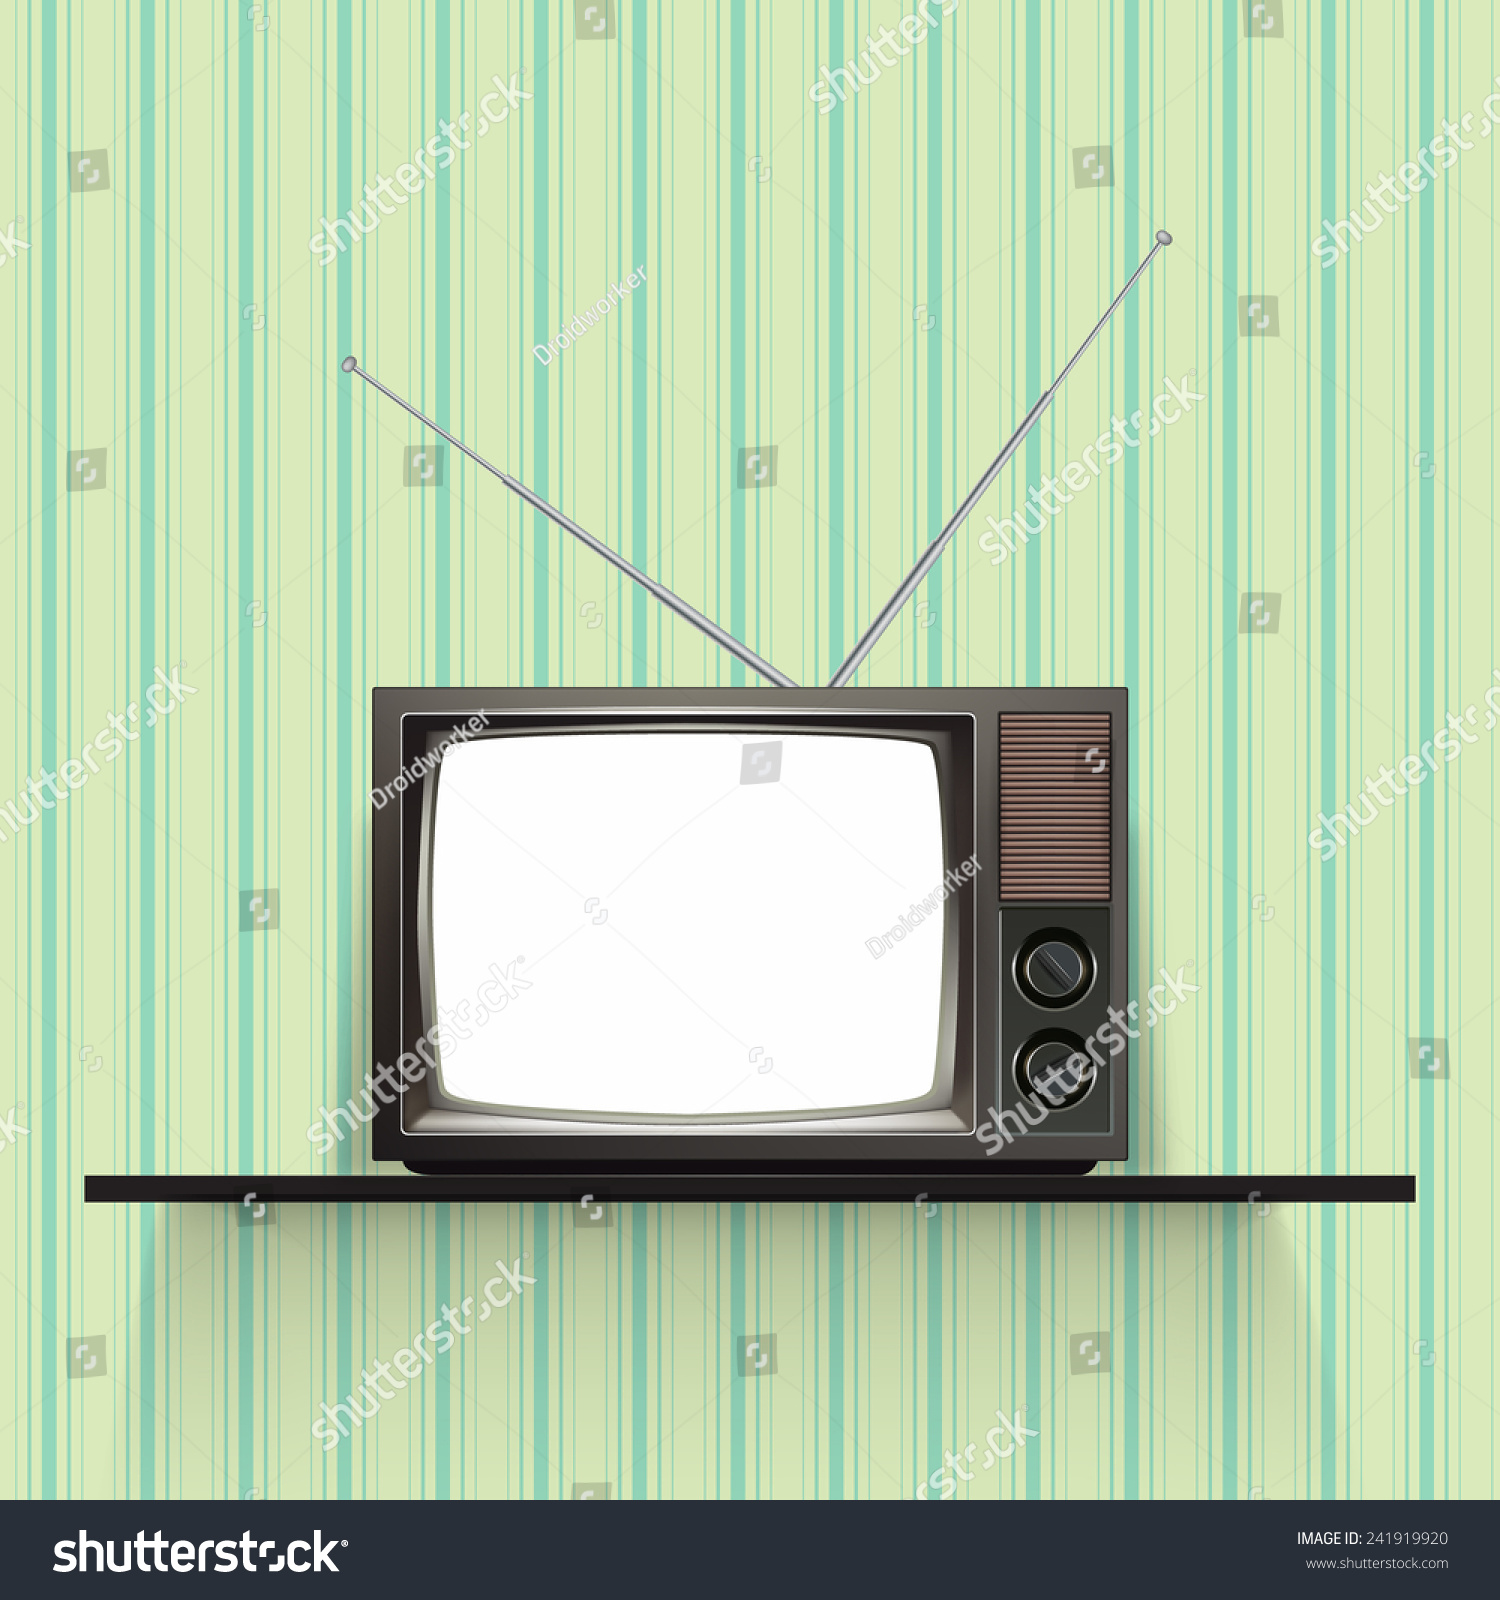 Vintage Television Wallpaper Blank retro tv with vintage wallpaper ...